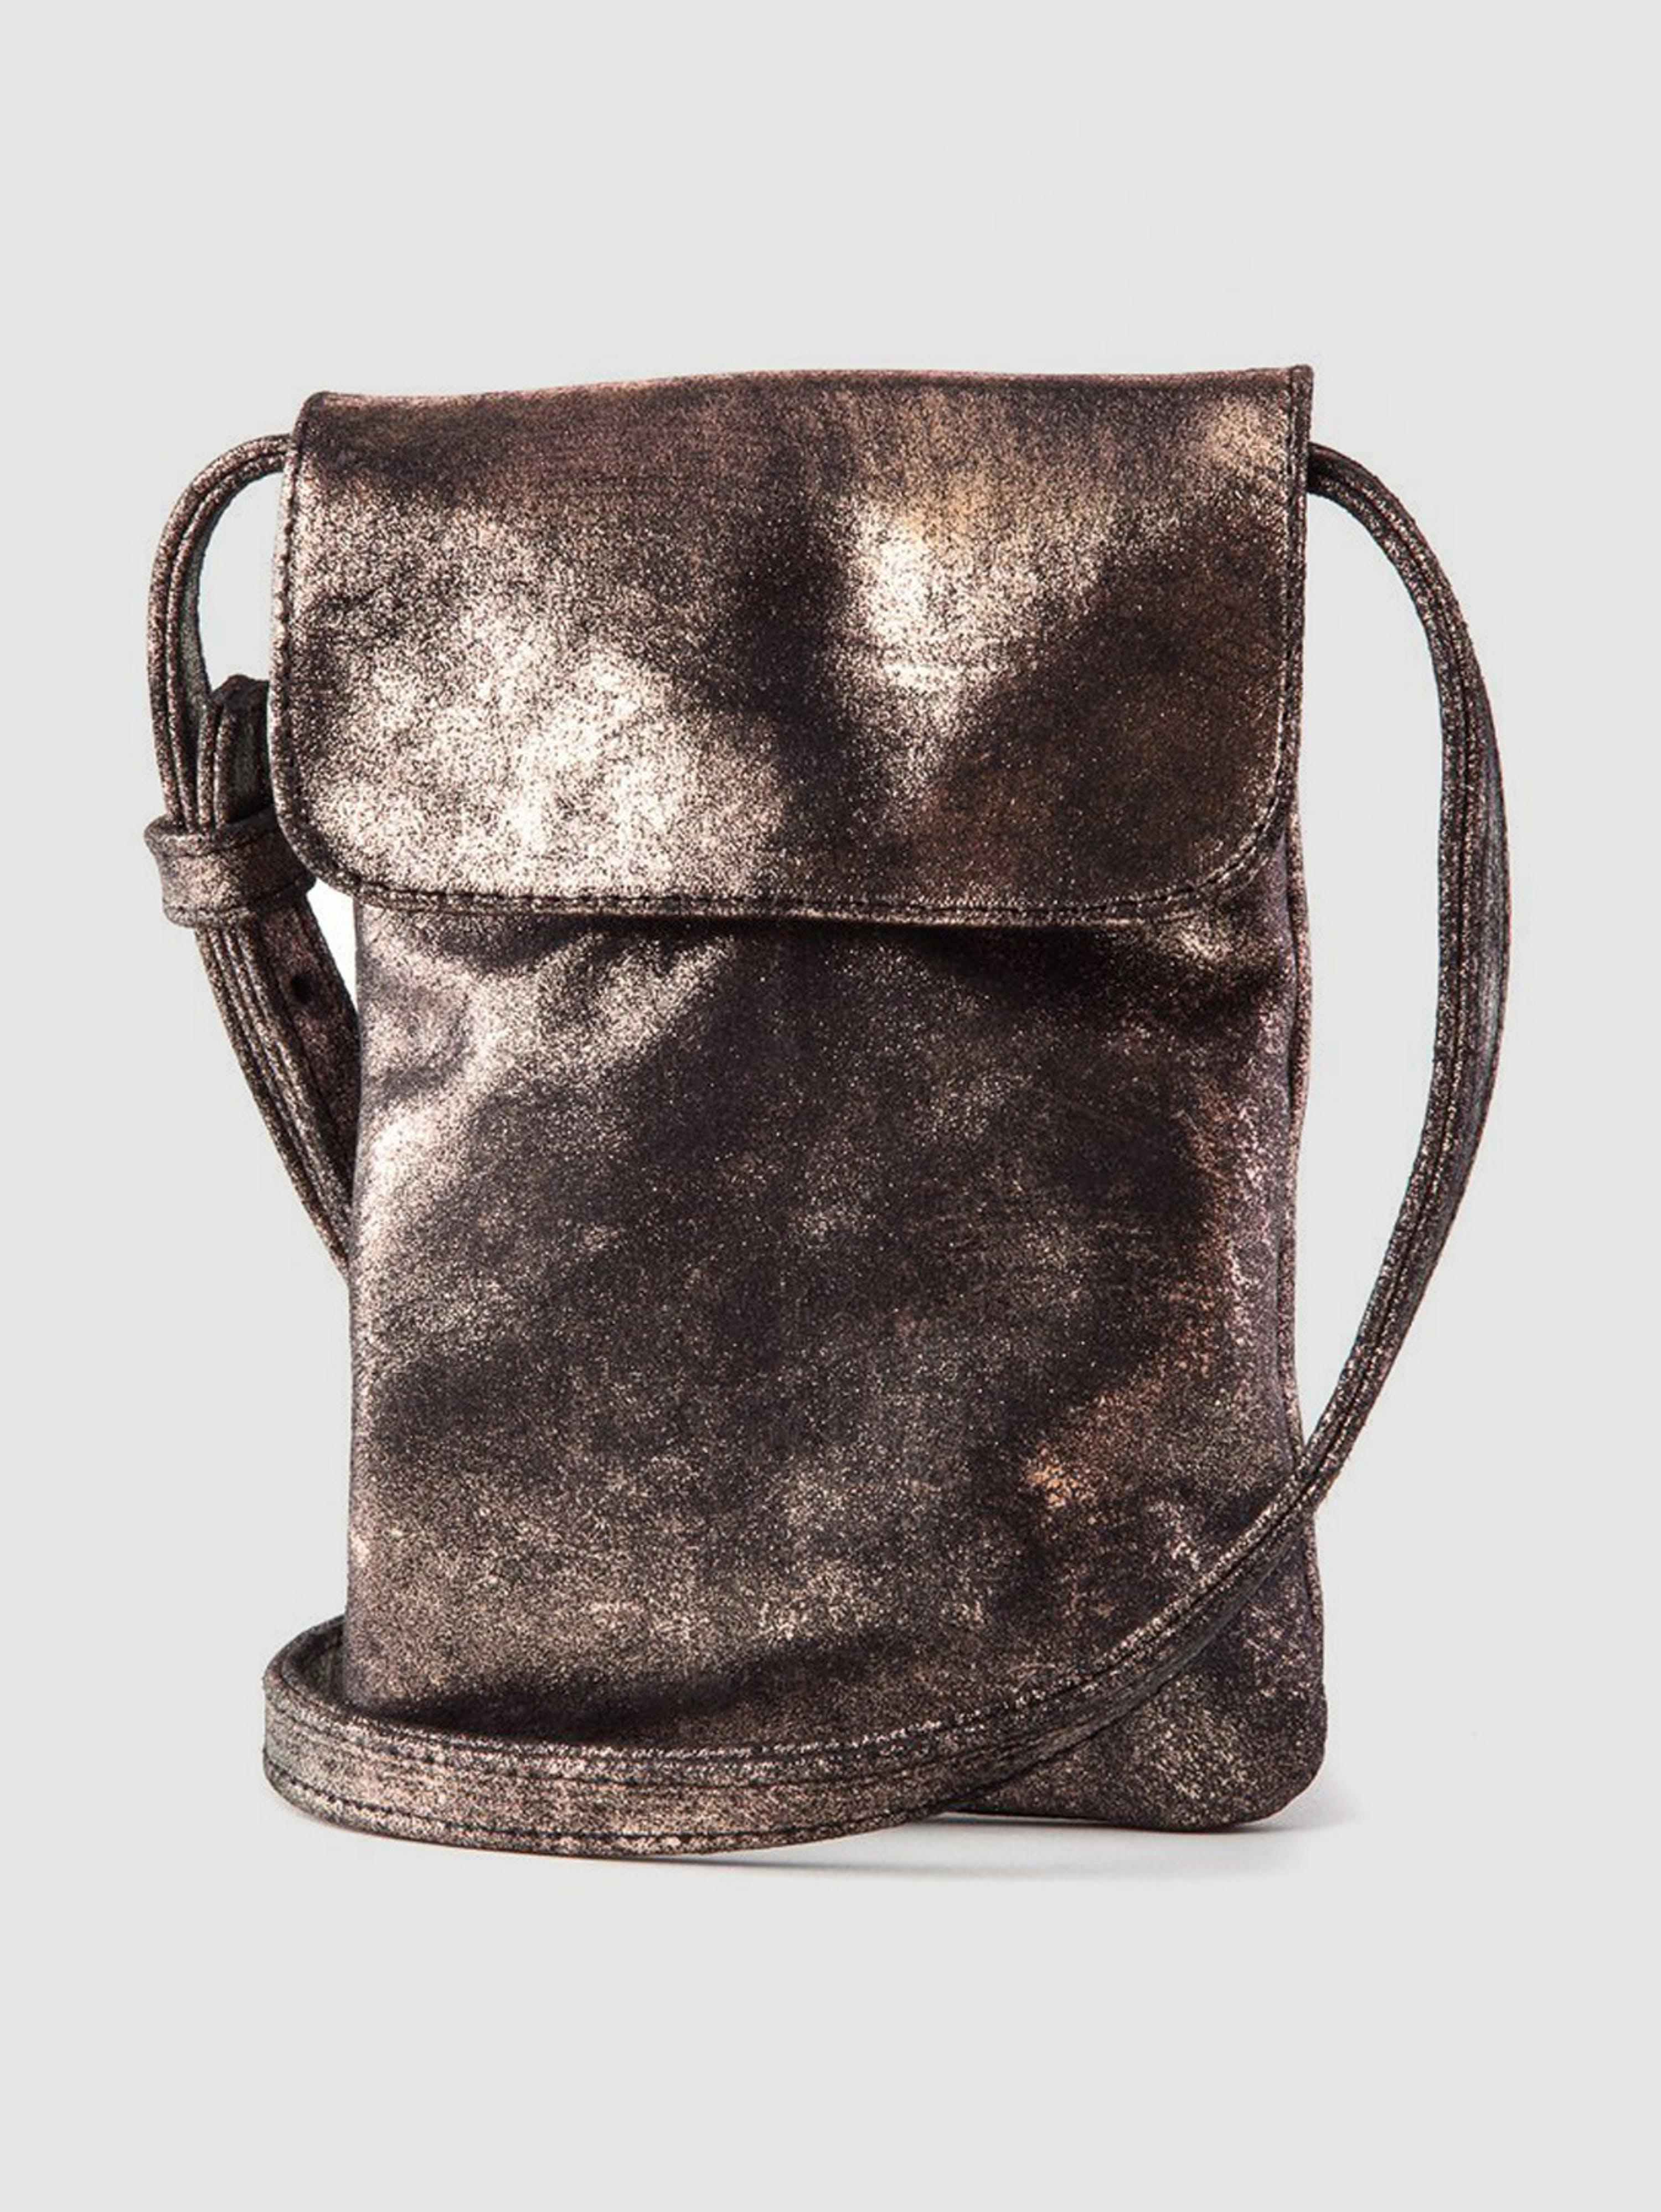 CoFi Leathers Penny Phone Bag: Rose Gold Black  - Brown